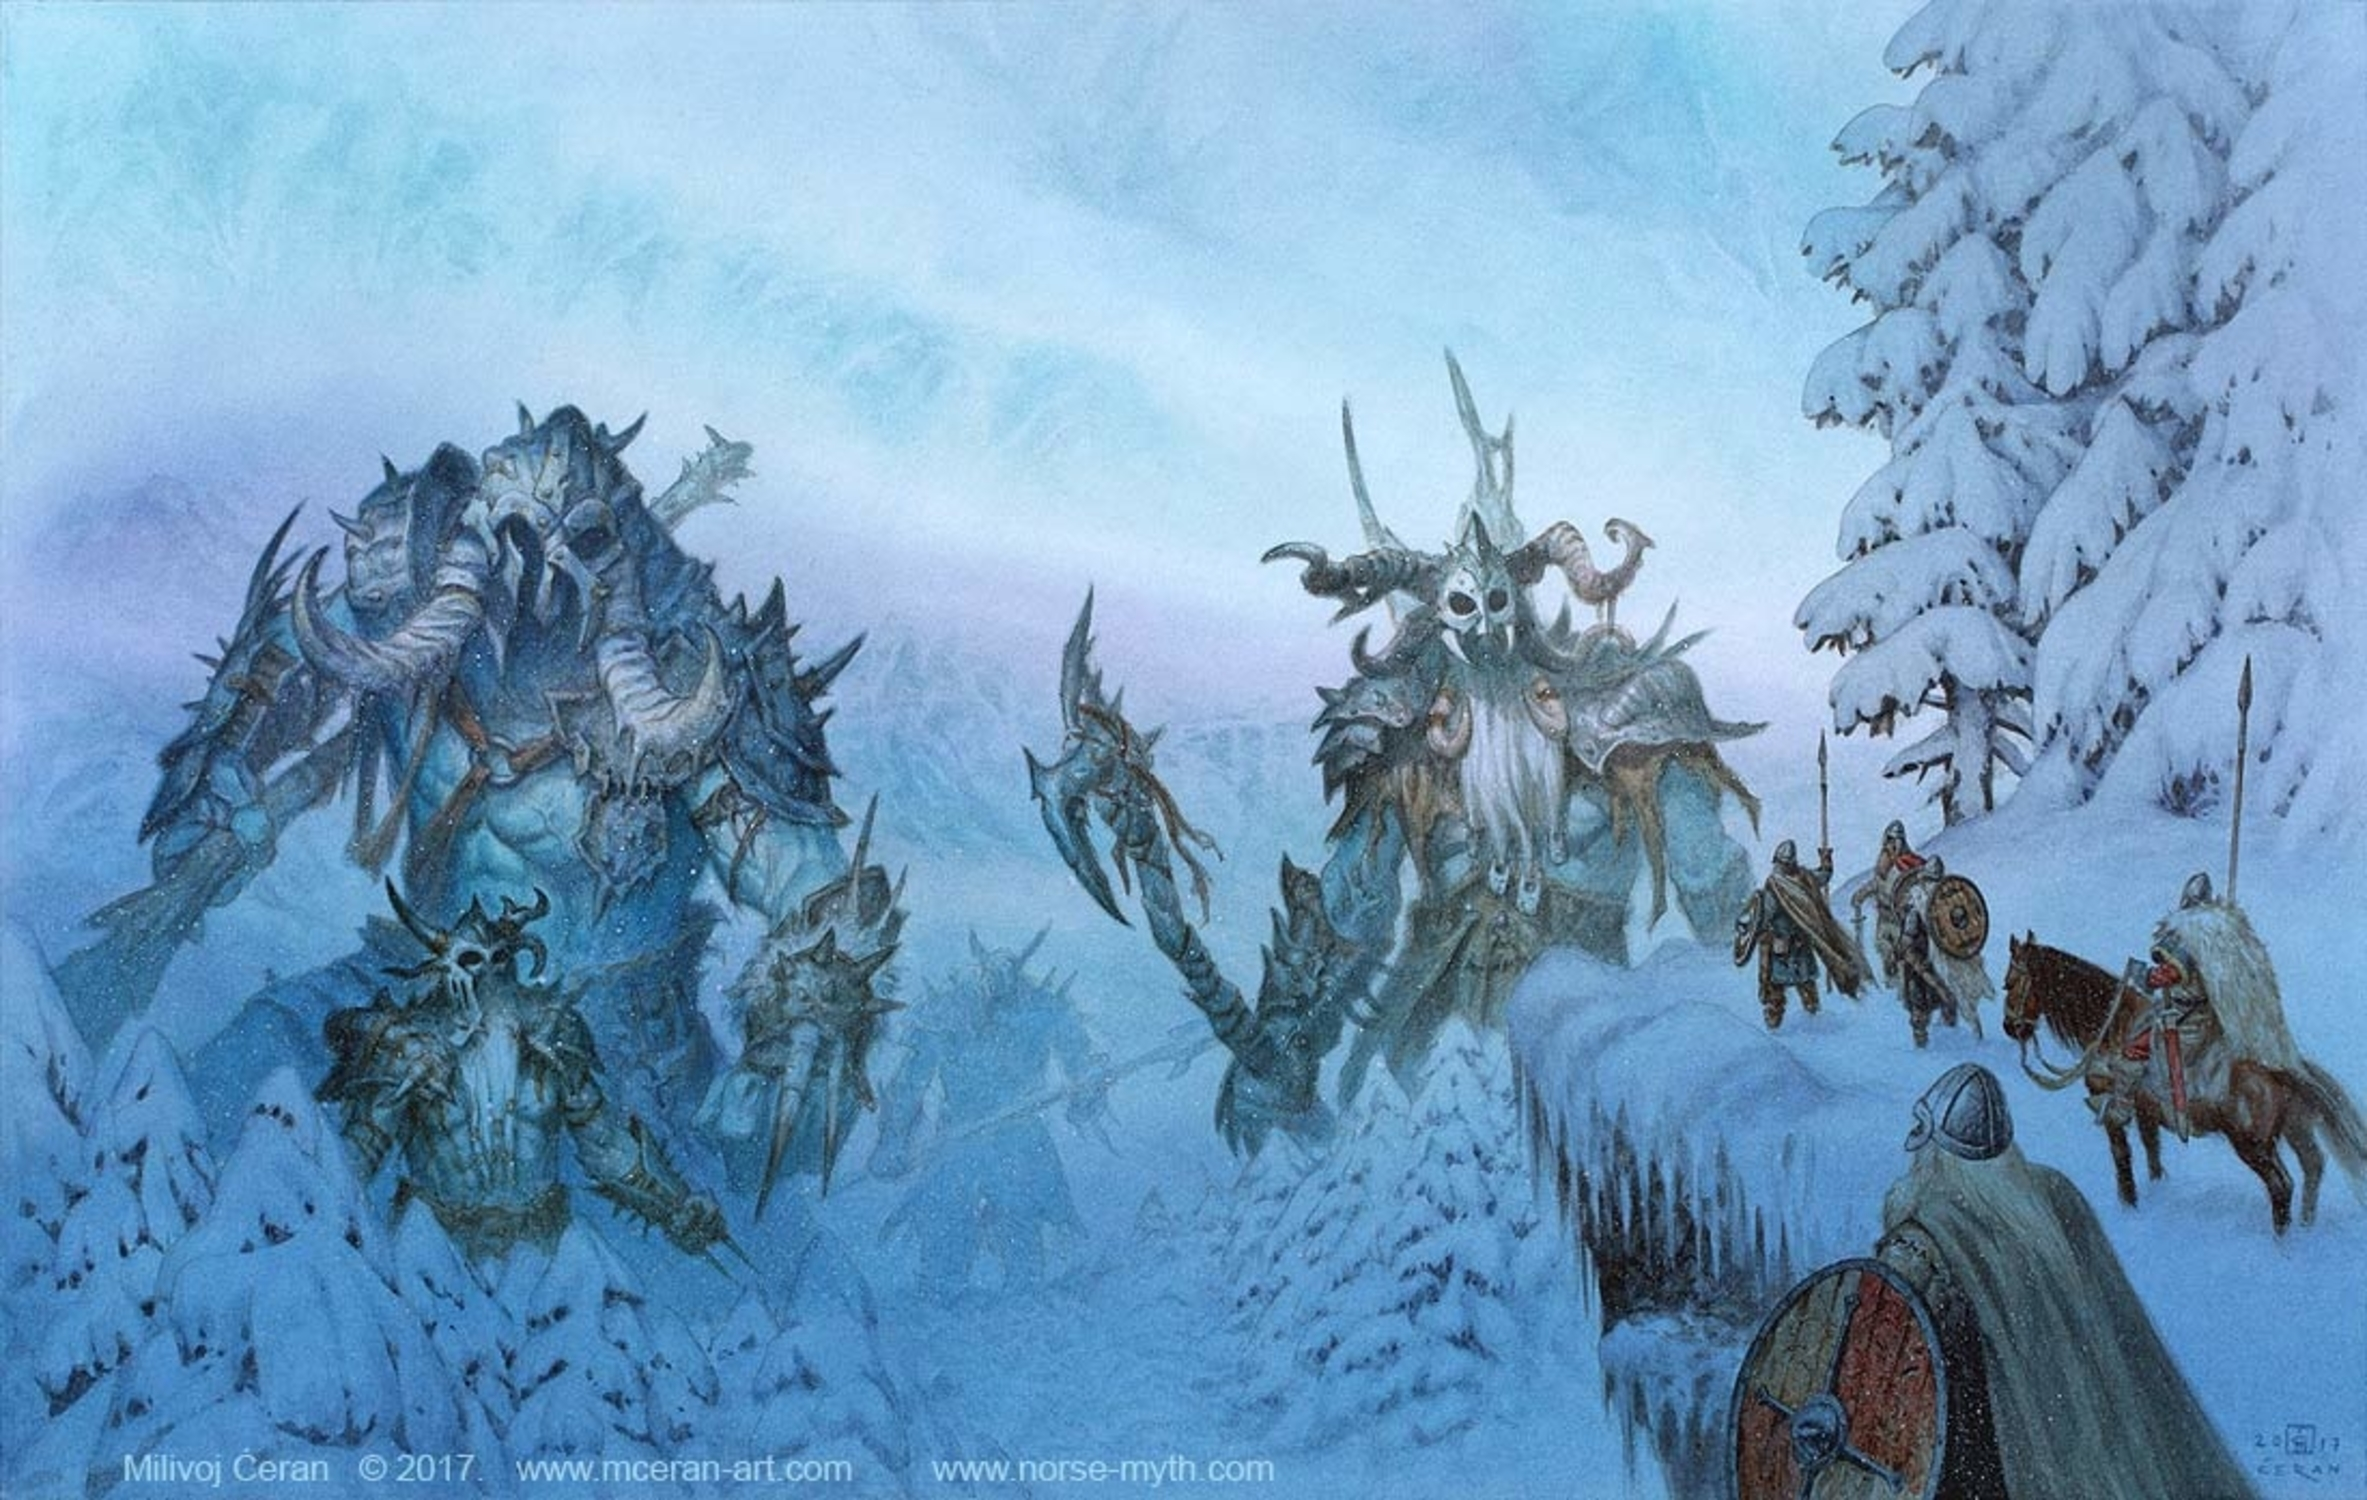 Jotunheim Artwork by Milivoj Ceran